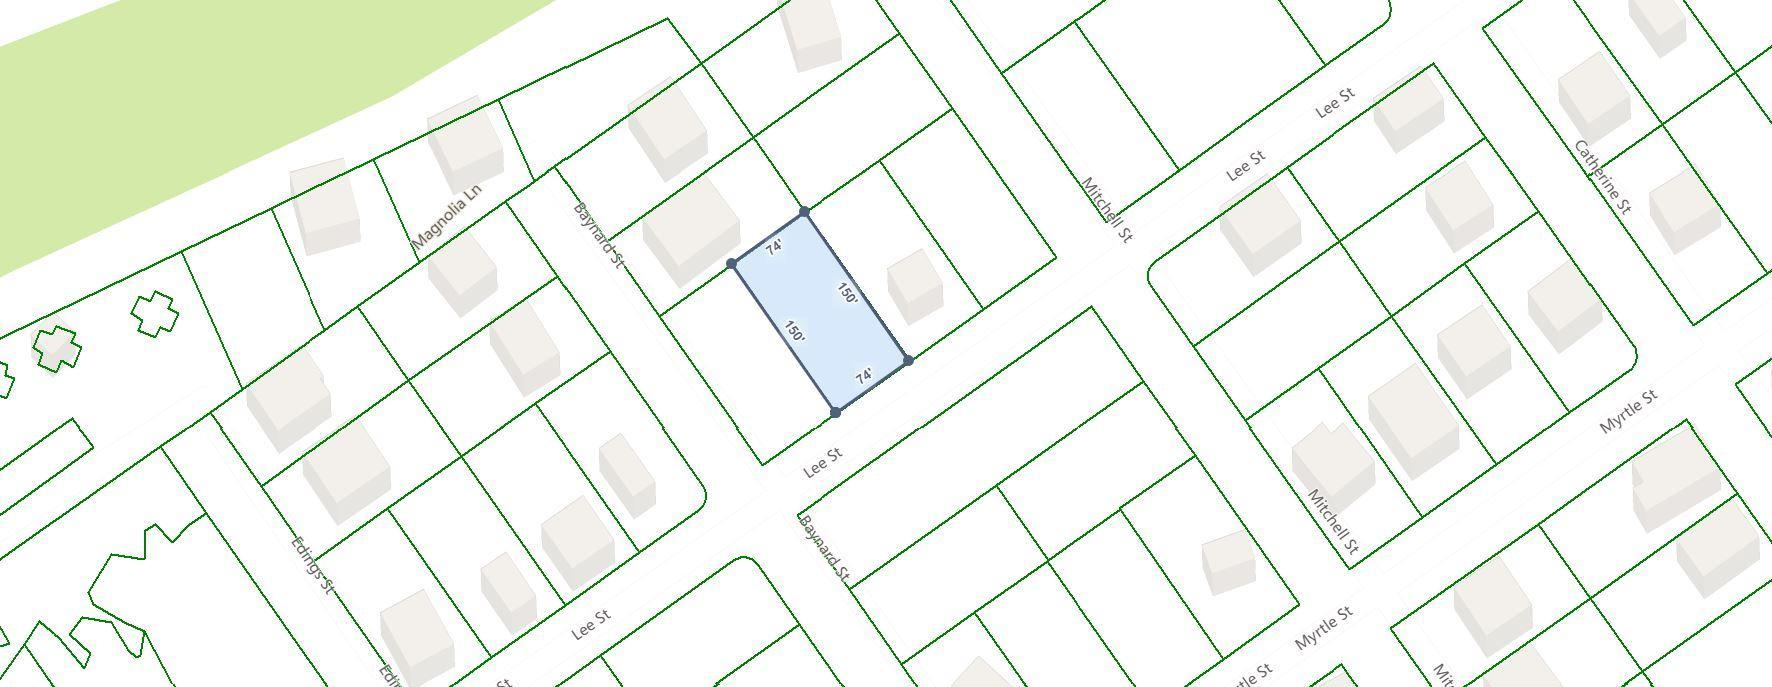 1905 Lee Street Edisto Island, SC 29438